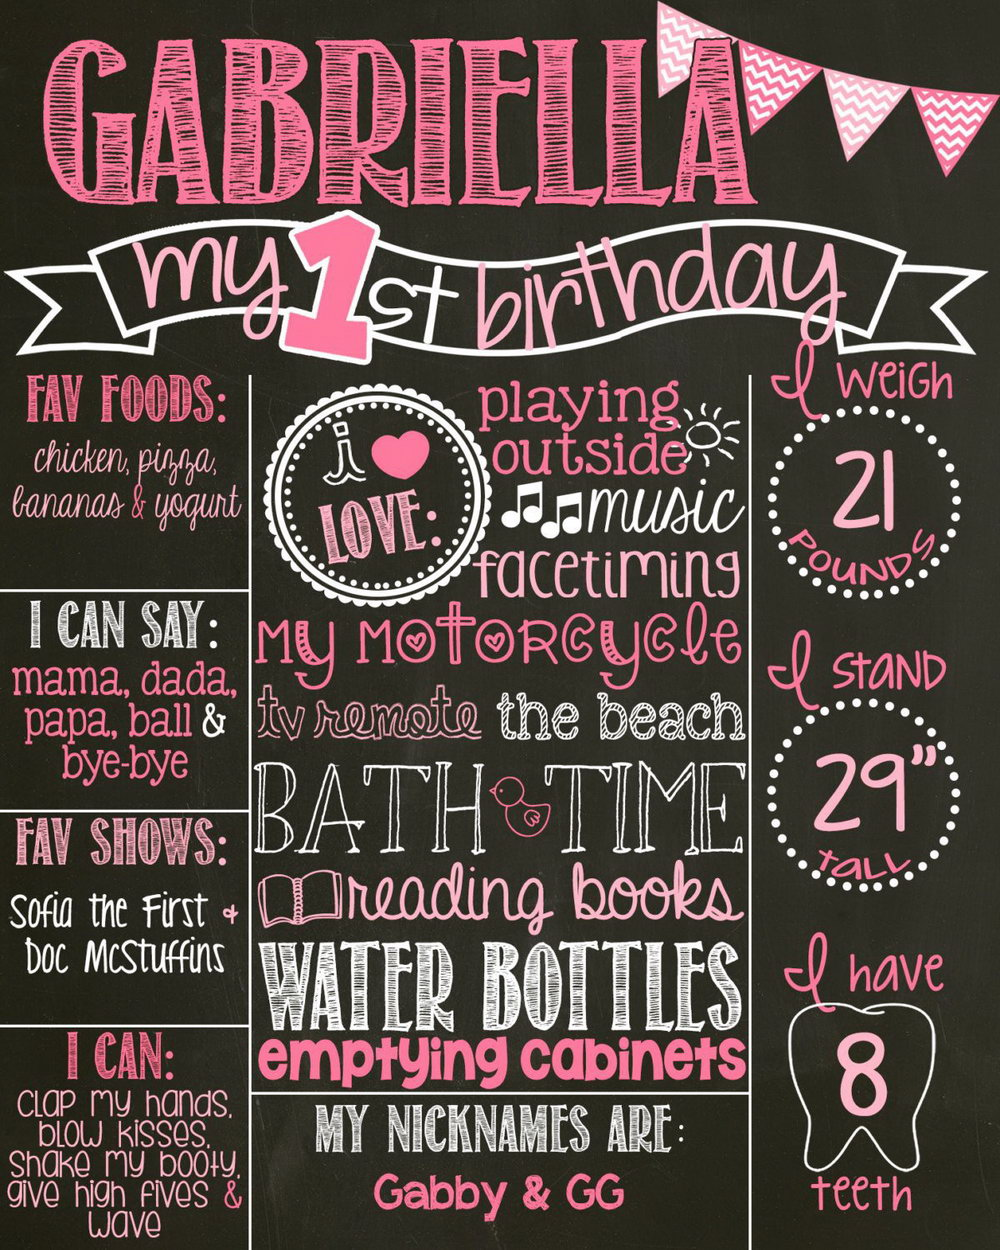 1st Birthday Chalkboard Poster Template